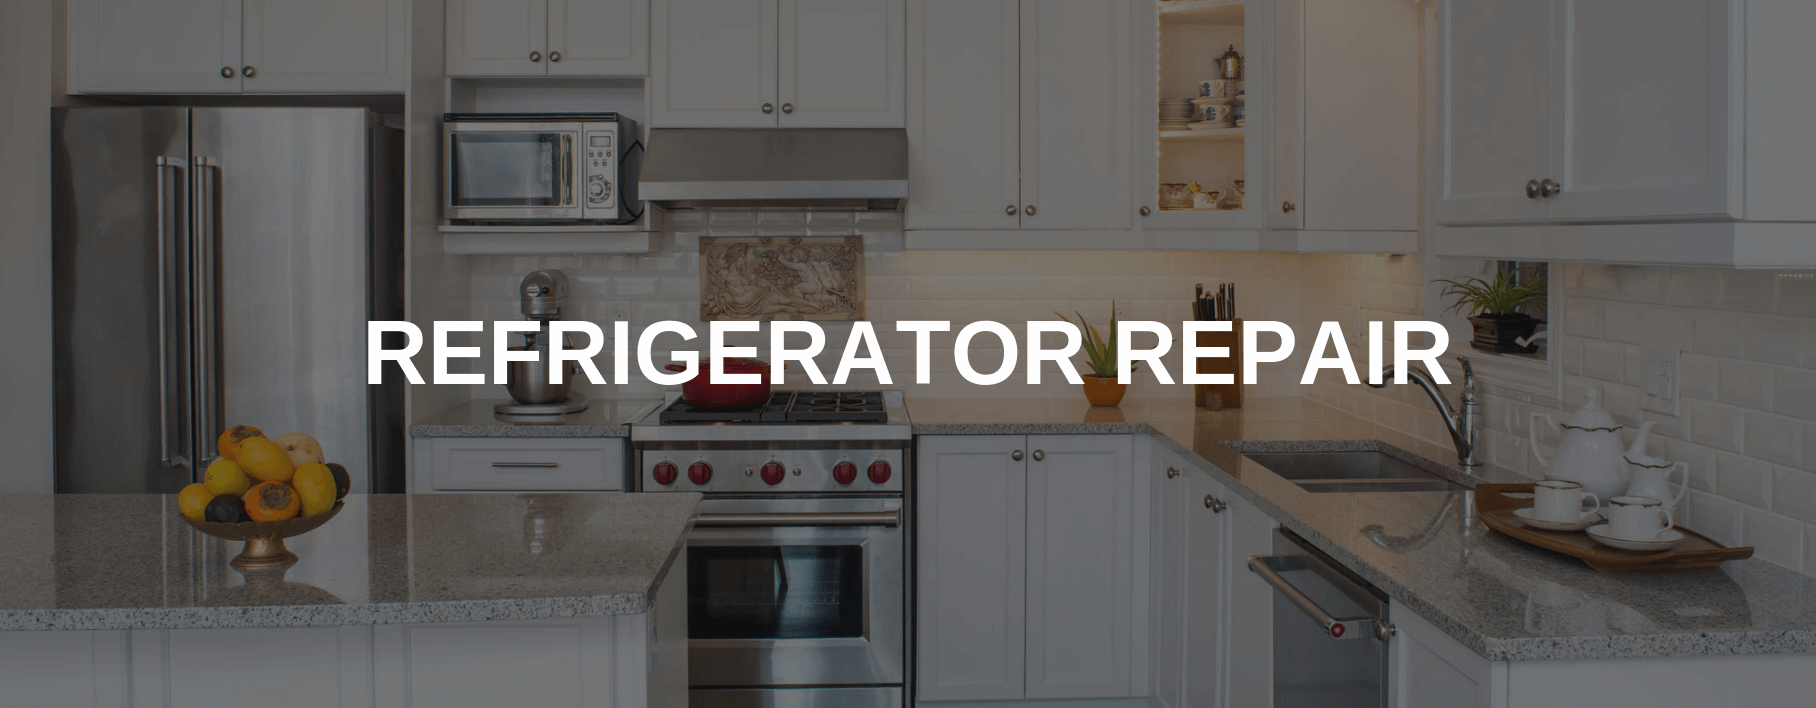 worcester refrigerator repair